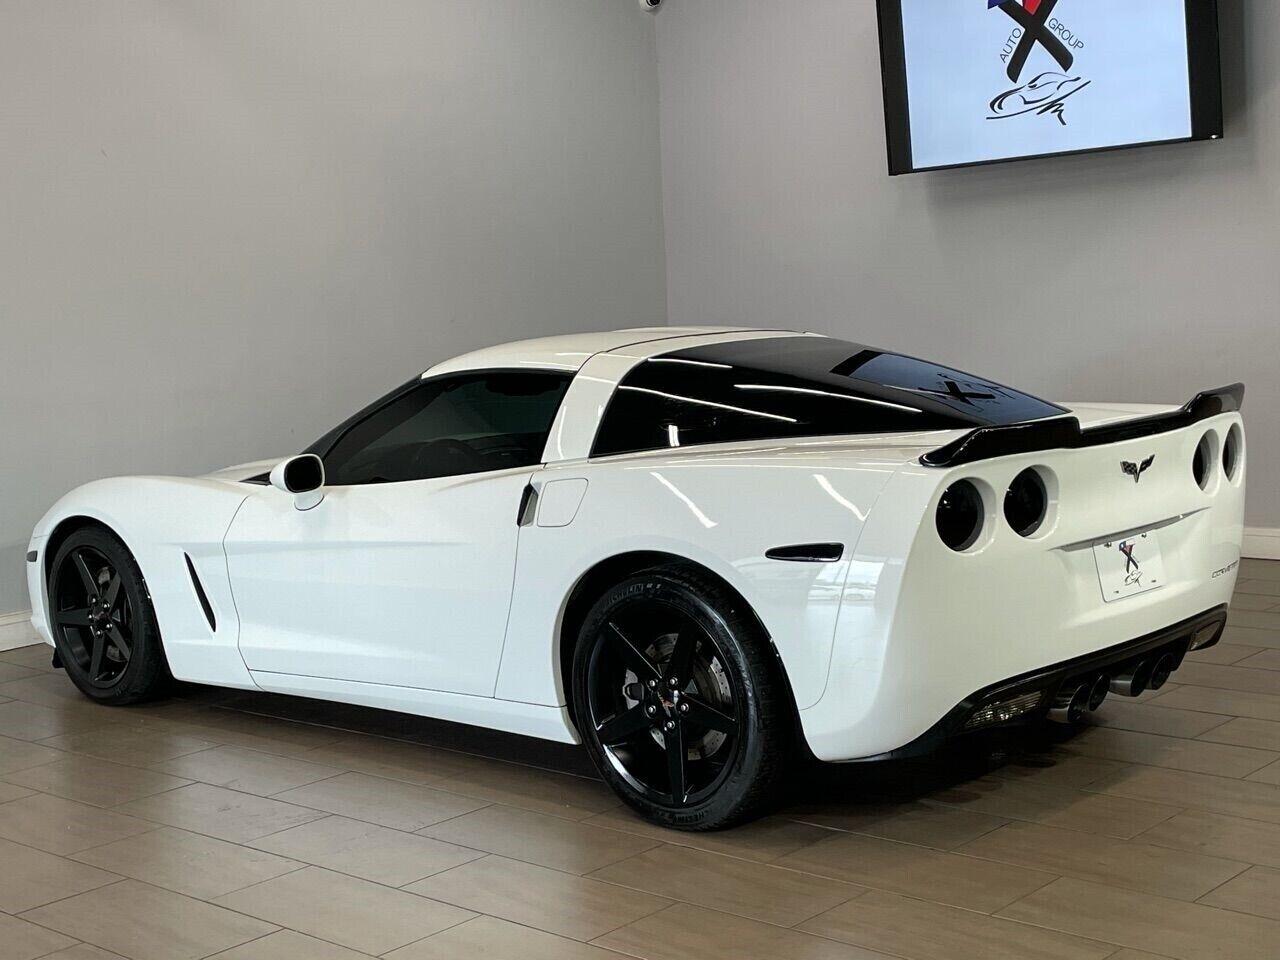 2007 White Chevrolet Corvette Coupe  | C6 Corvette Photo 9